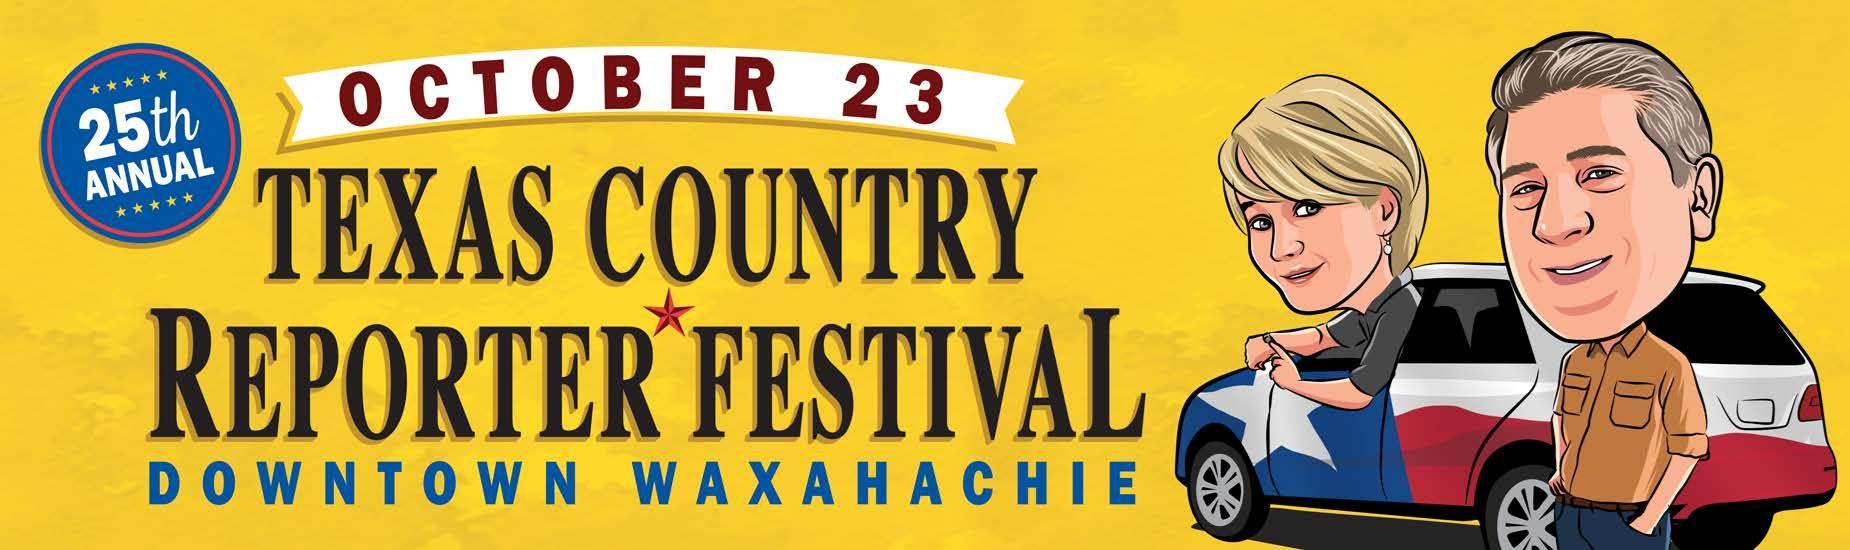 Texas Country Reporter Festival   10.23.21